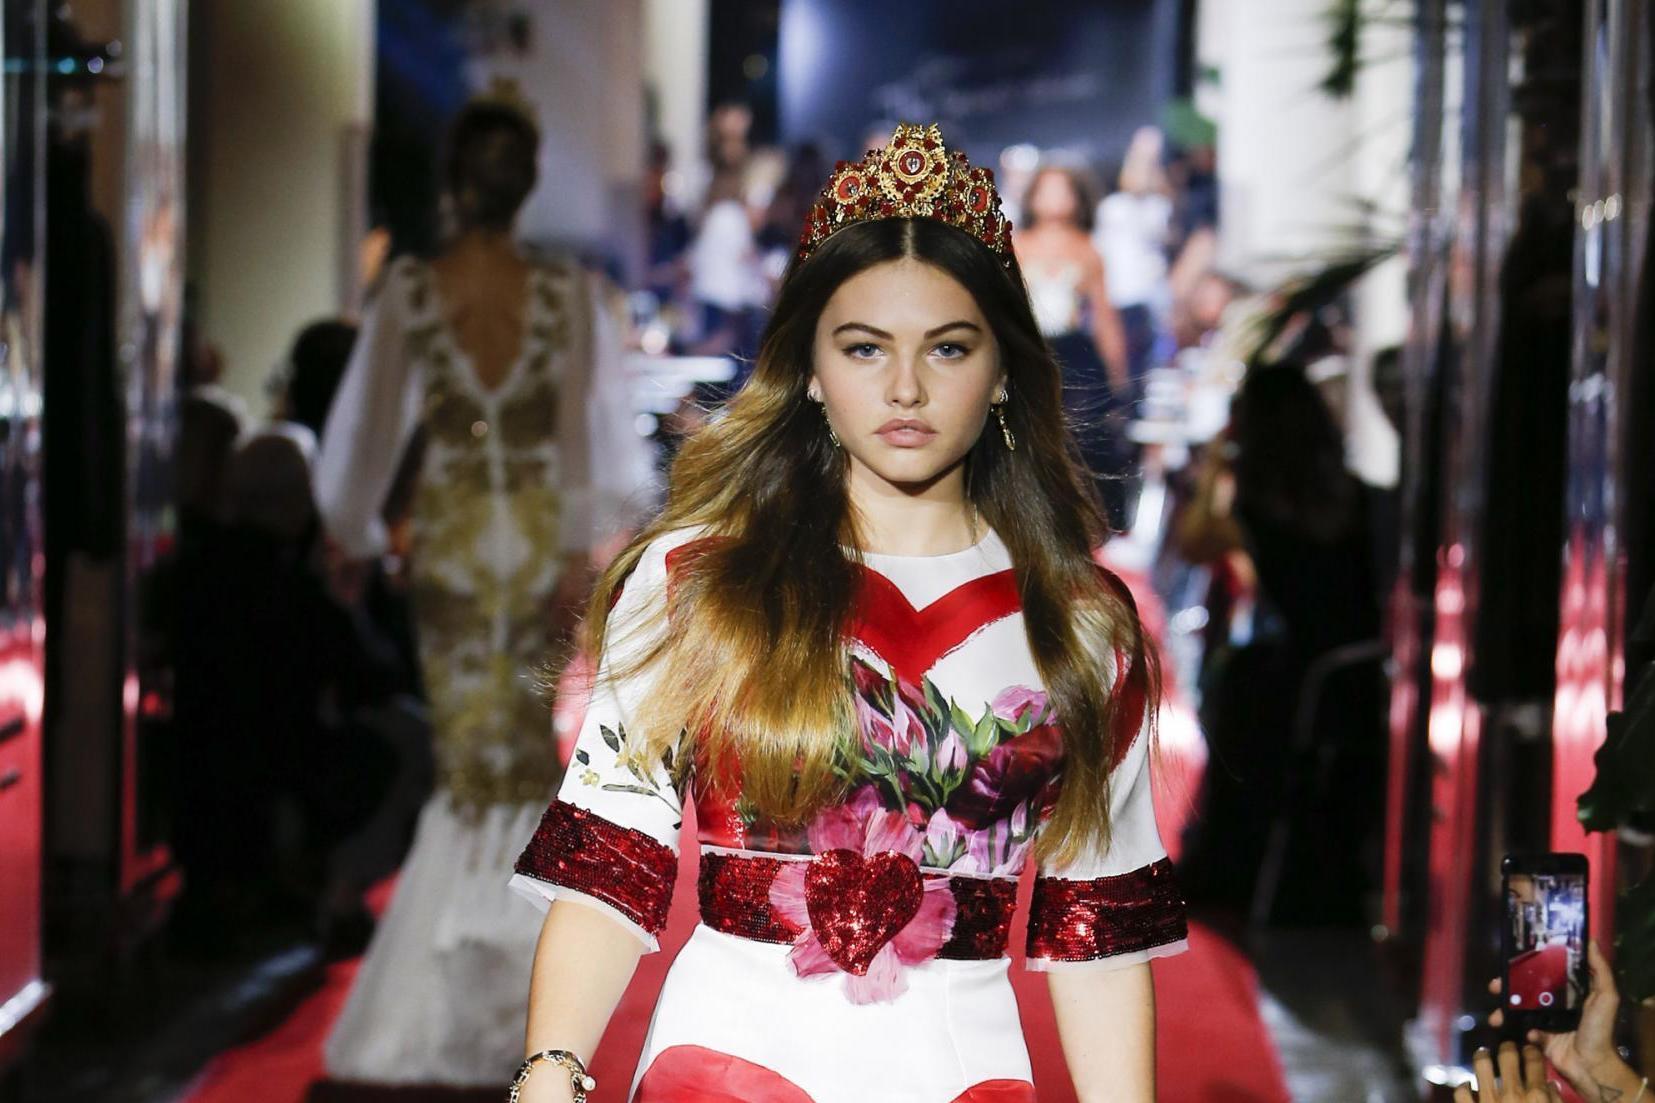 milan fashion week 2017 u0027most beautiful in the world